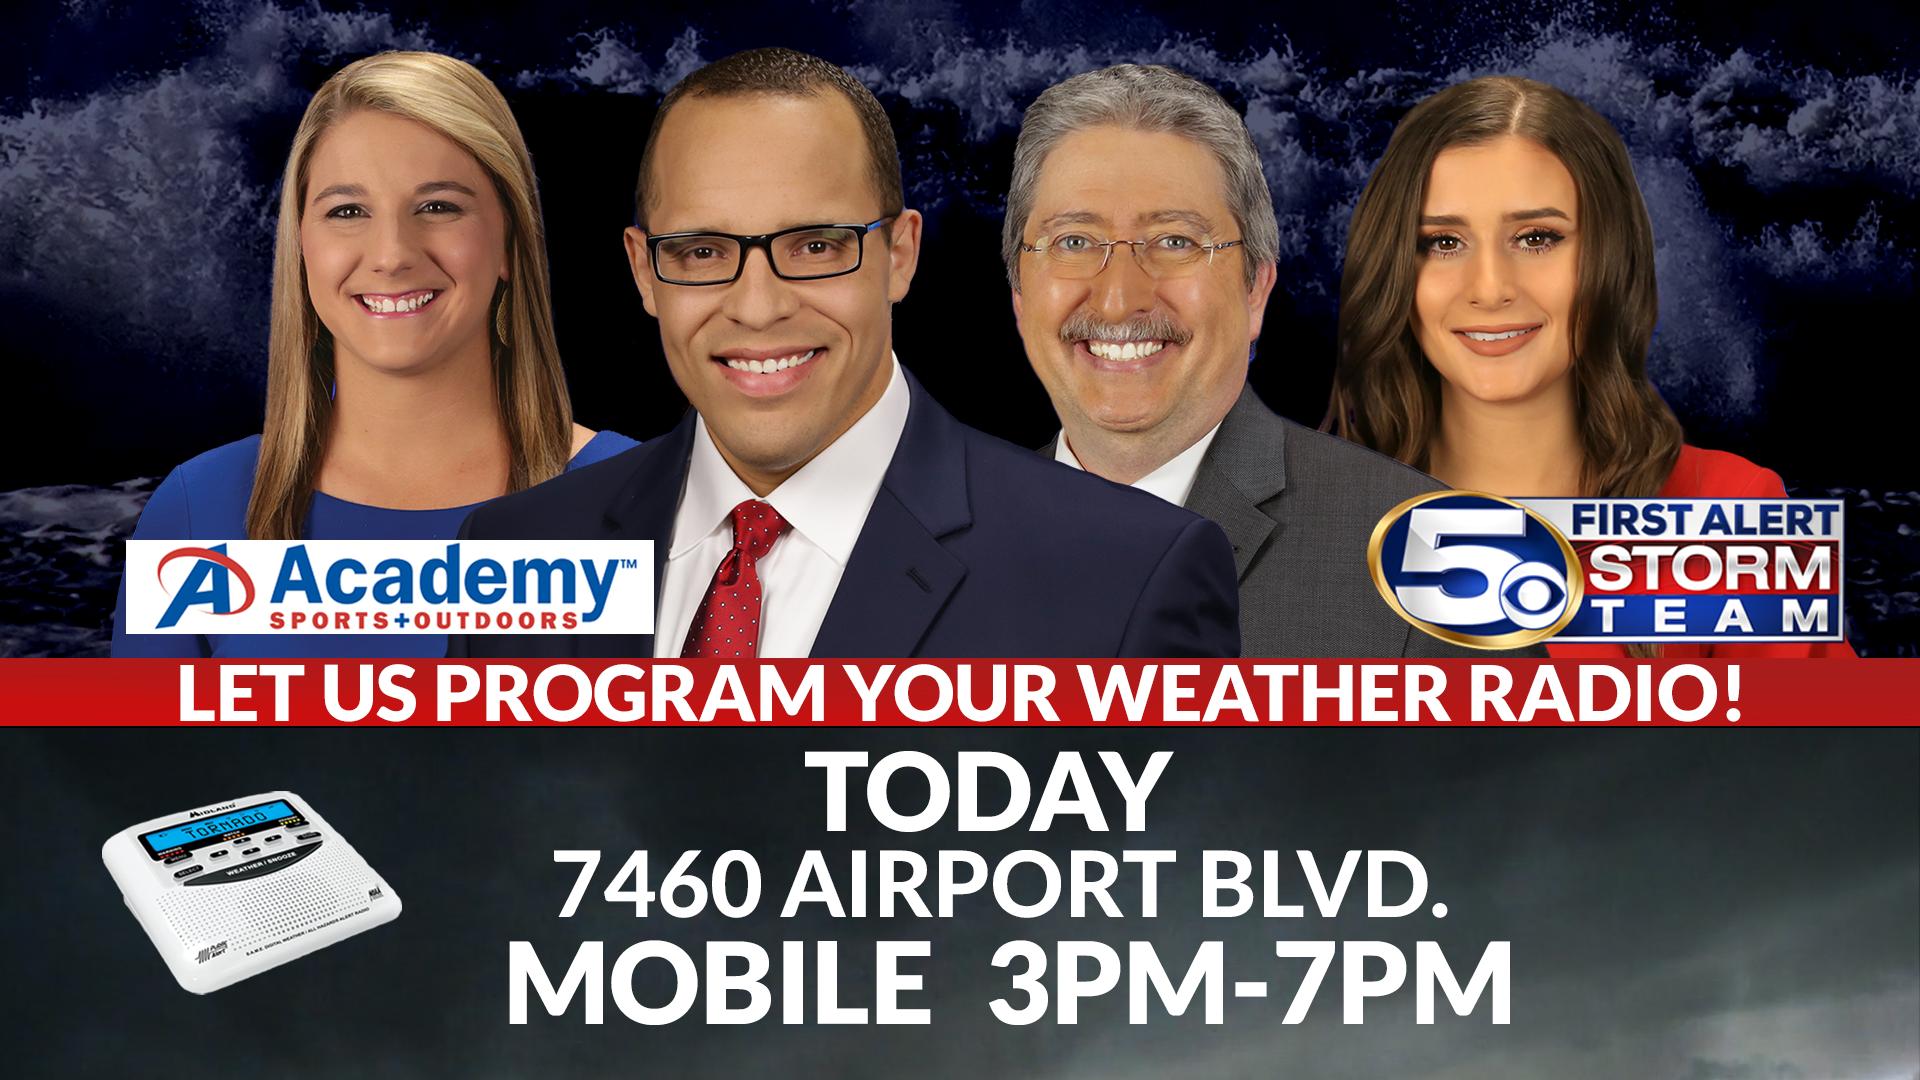 WKRG News 5 Weather Radio programming event